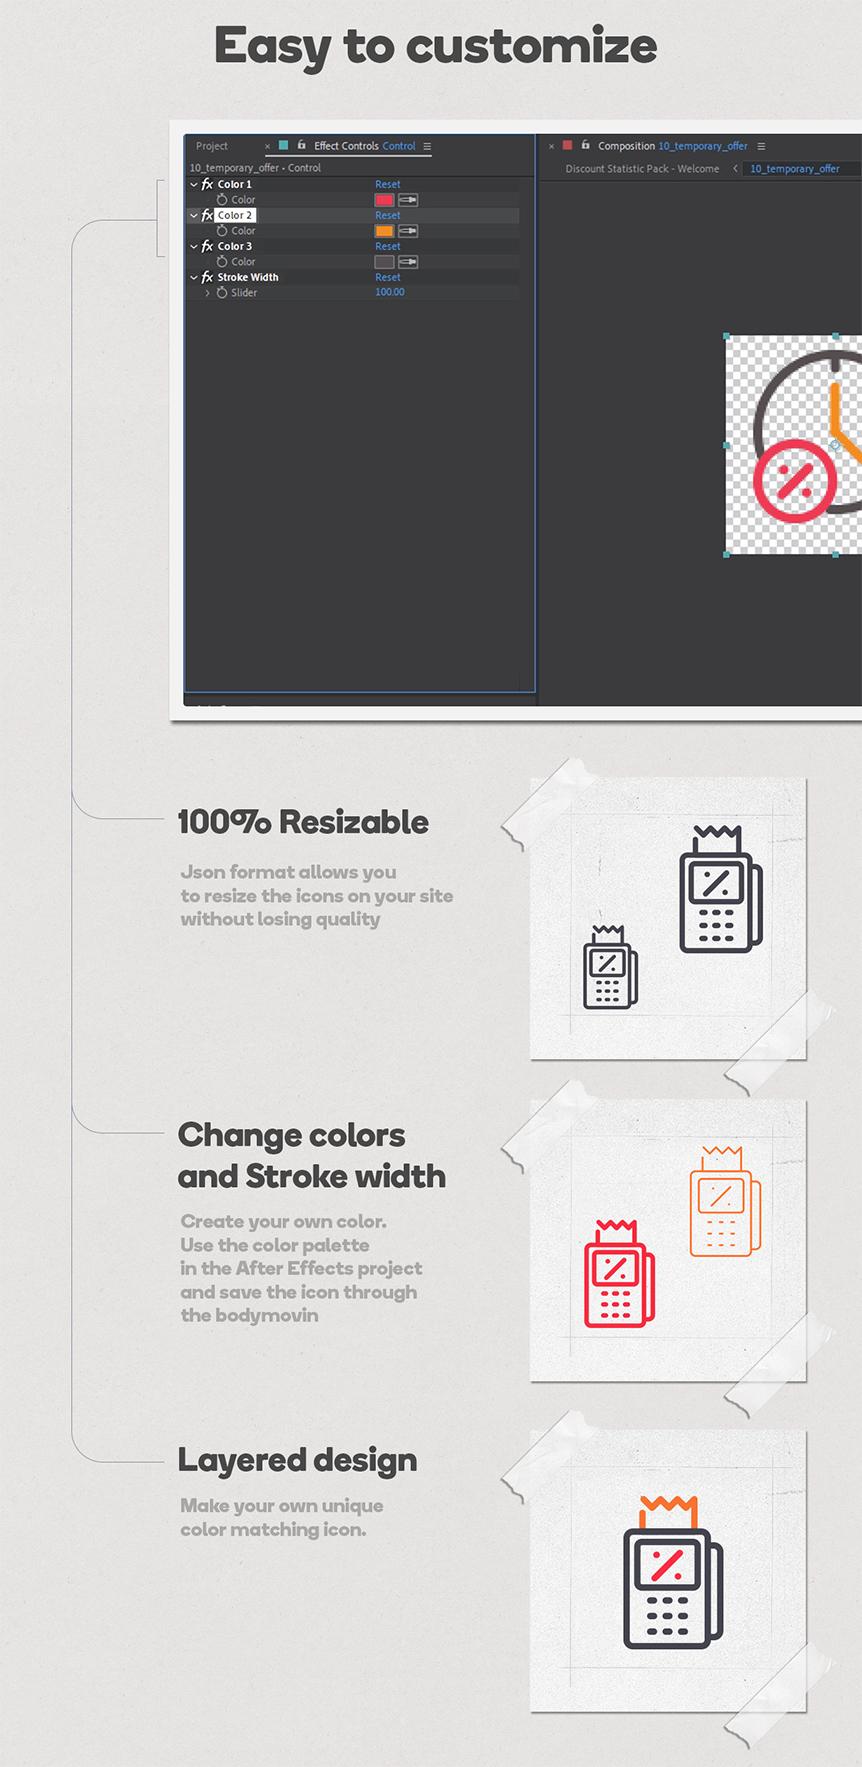 Business Bundle 256 Animated Lottie Icons - Ecommerce Marketing Office Discount - 5